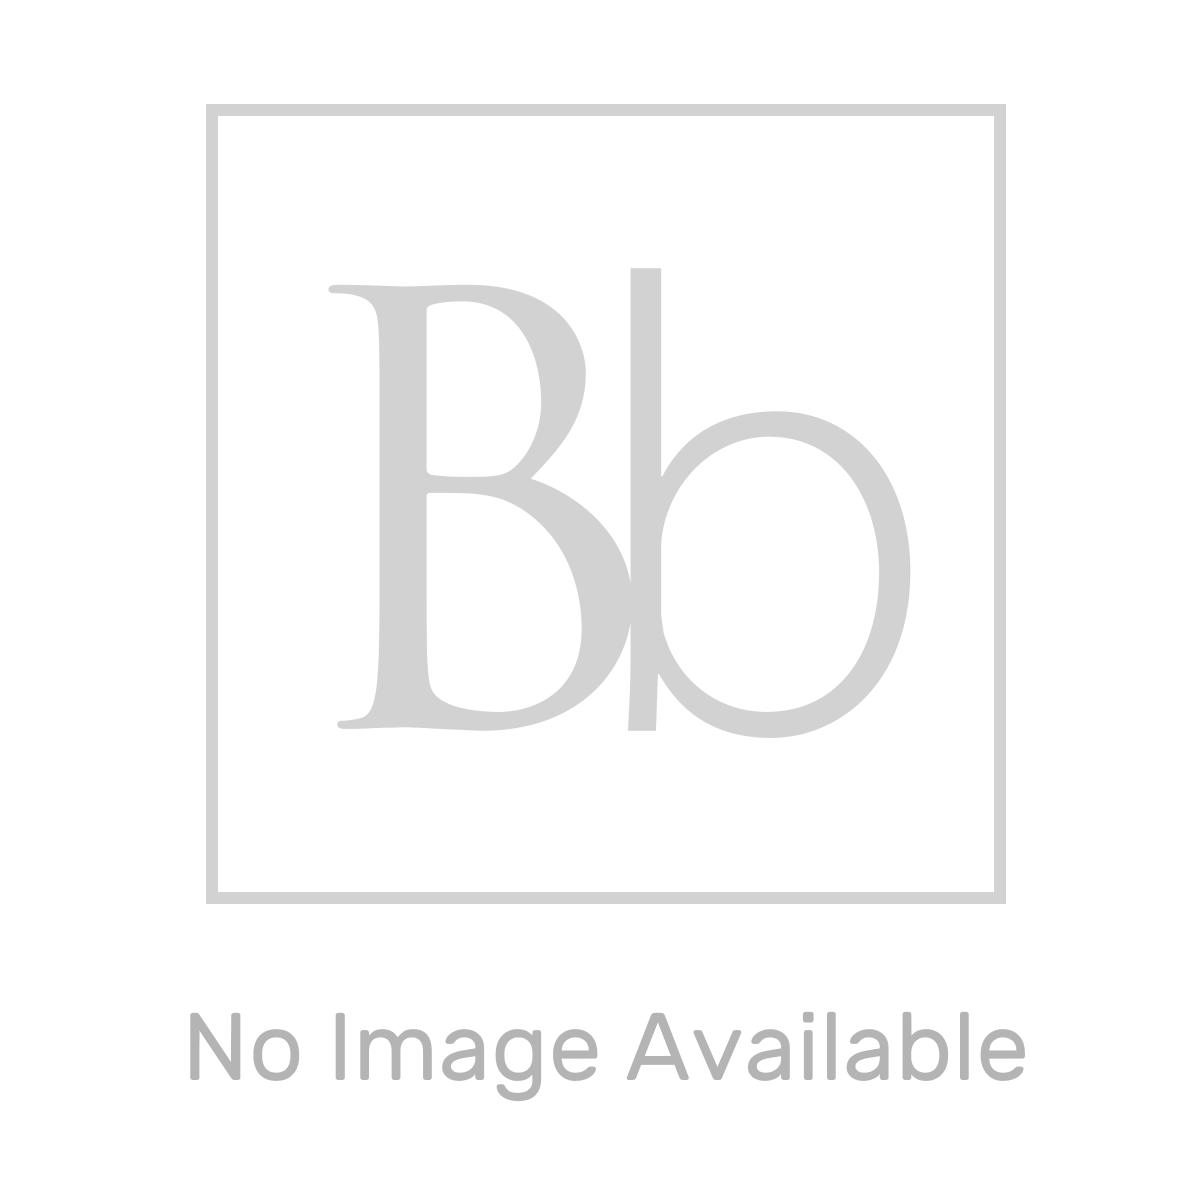 BTL Perla White 2 Drawer Wall Hung Vanity Unit 900mm